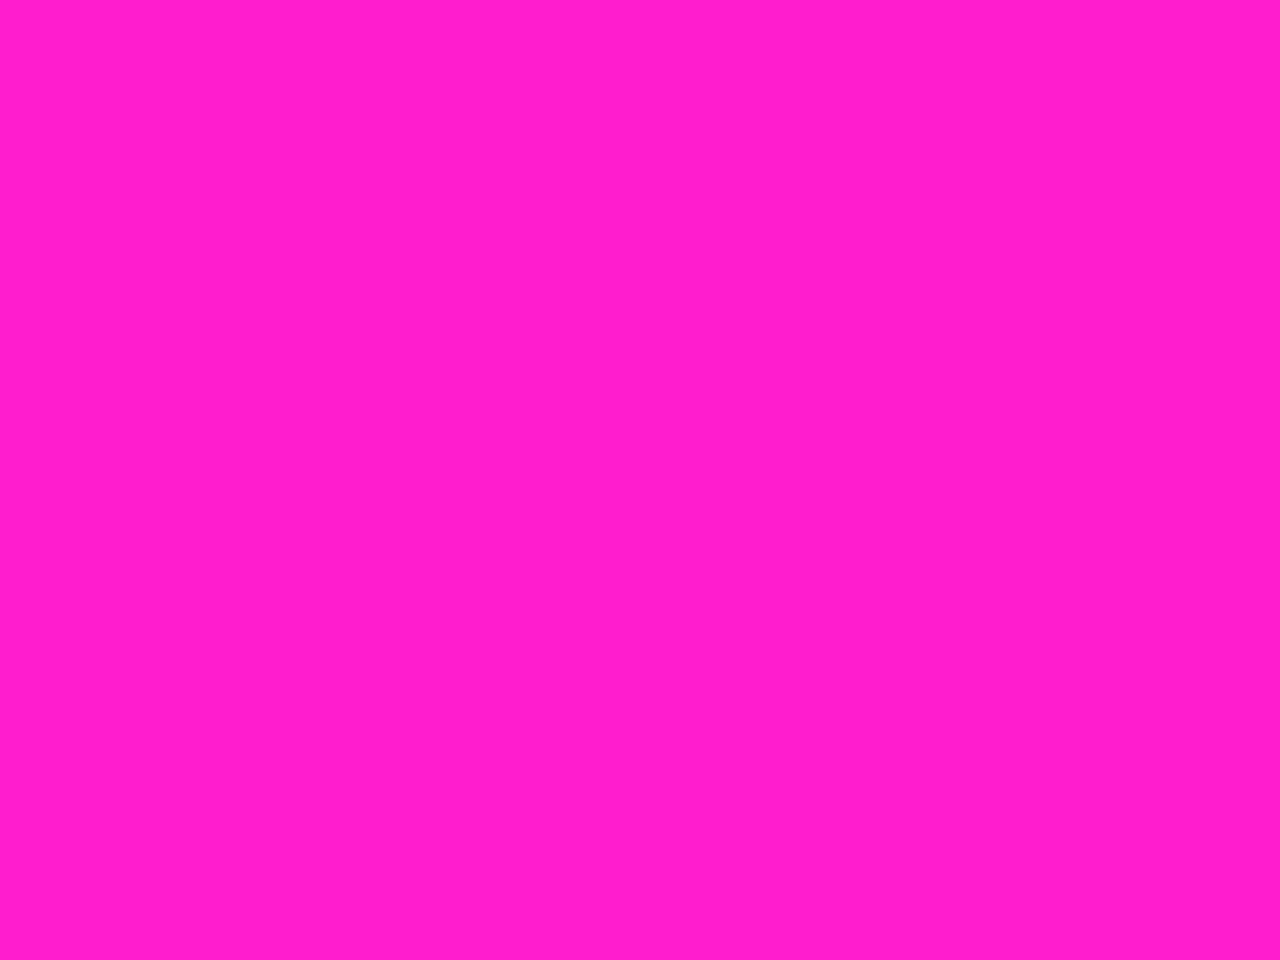 1280x960 Hot Magenta Solid Color Background